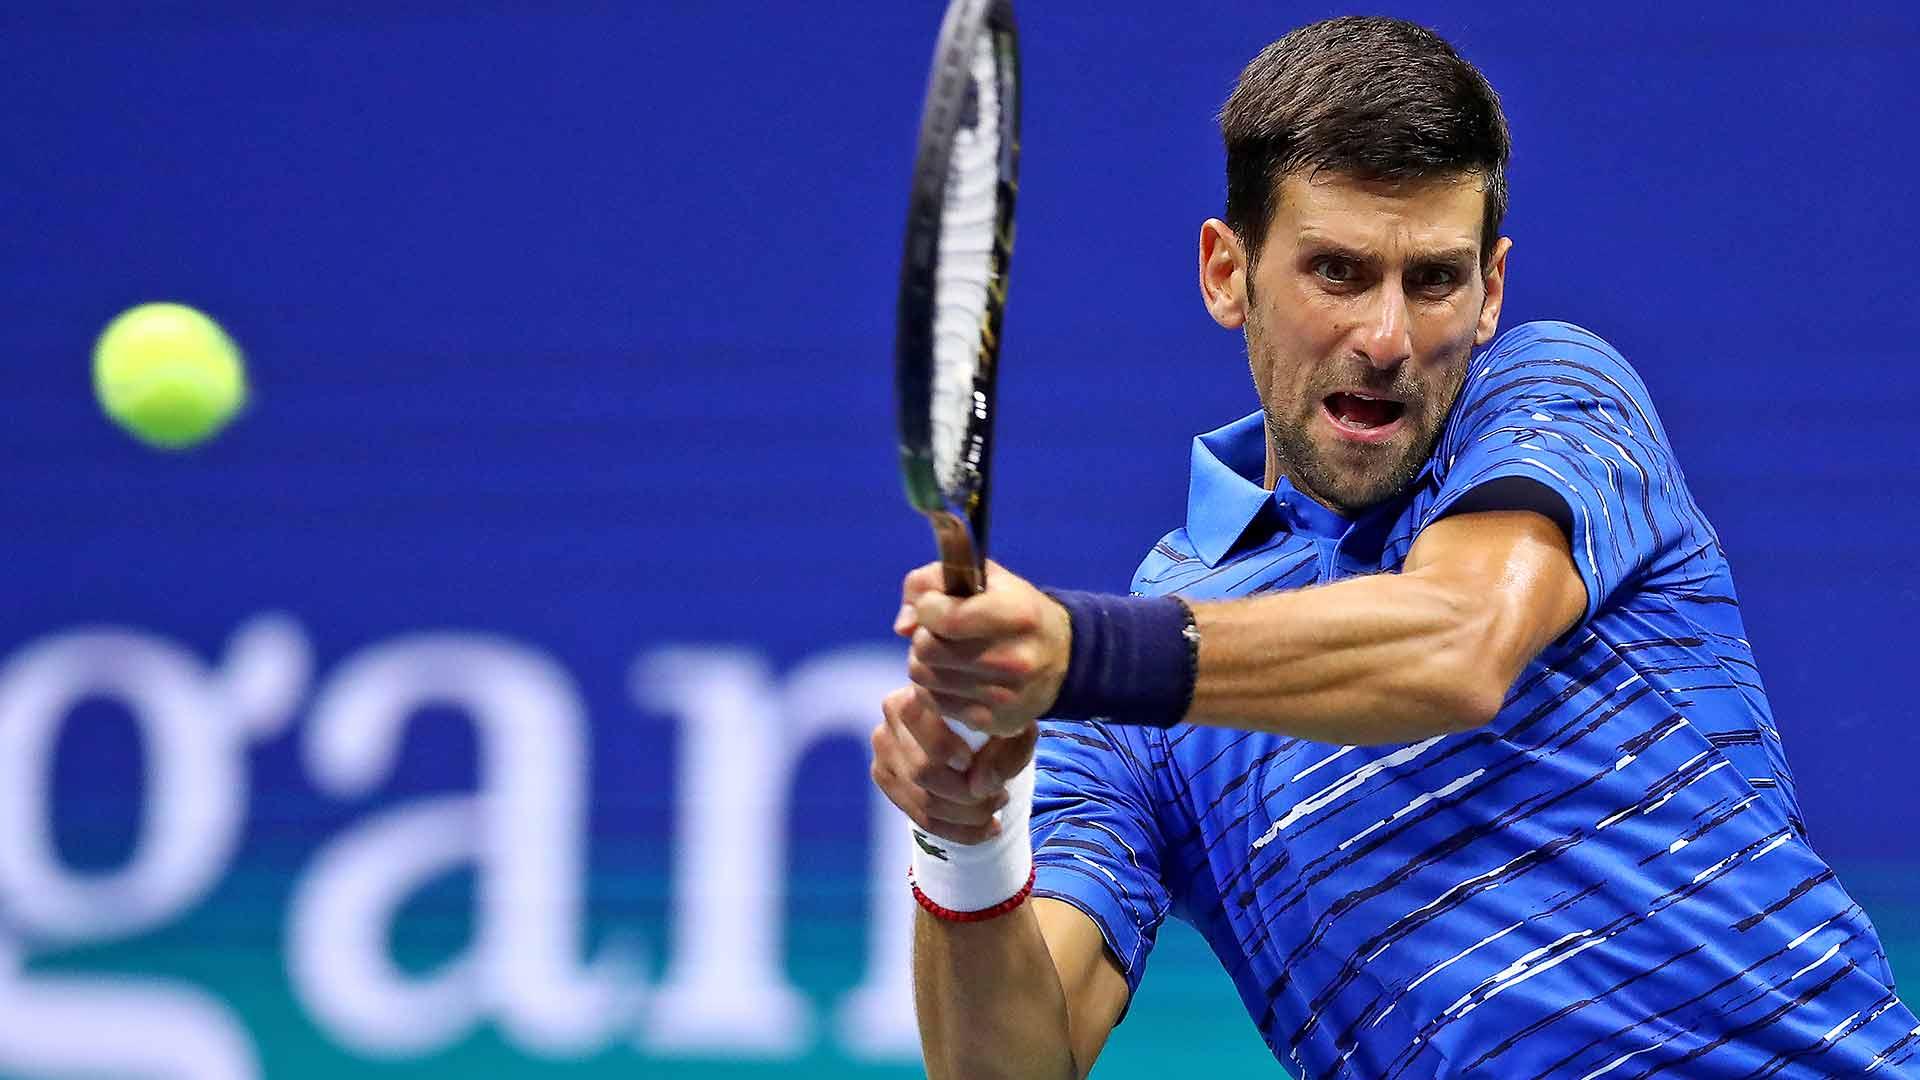 Us Open Tennis Novak Djokovic Matches Pete Sampras With 71st Us Open Match Win Atp Tour Tennis